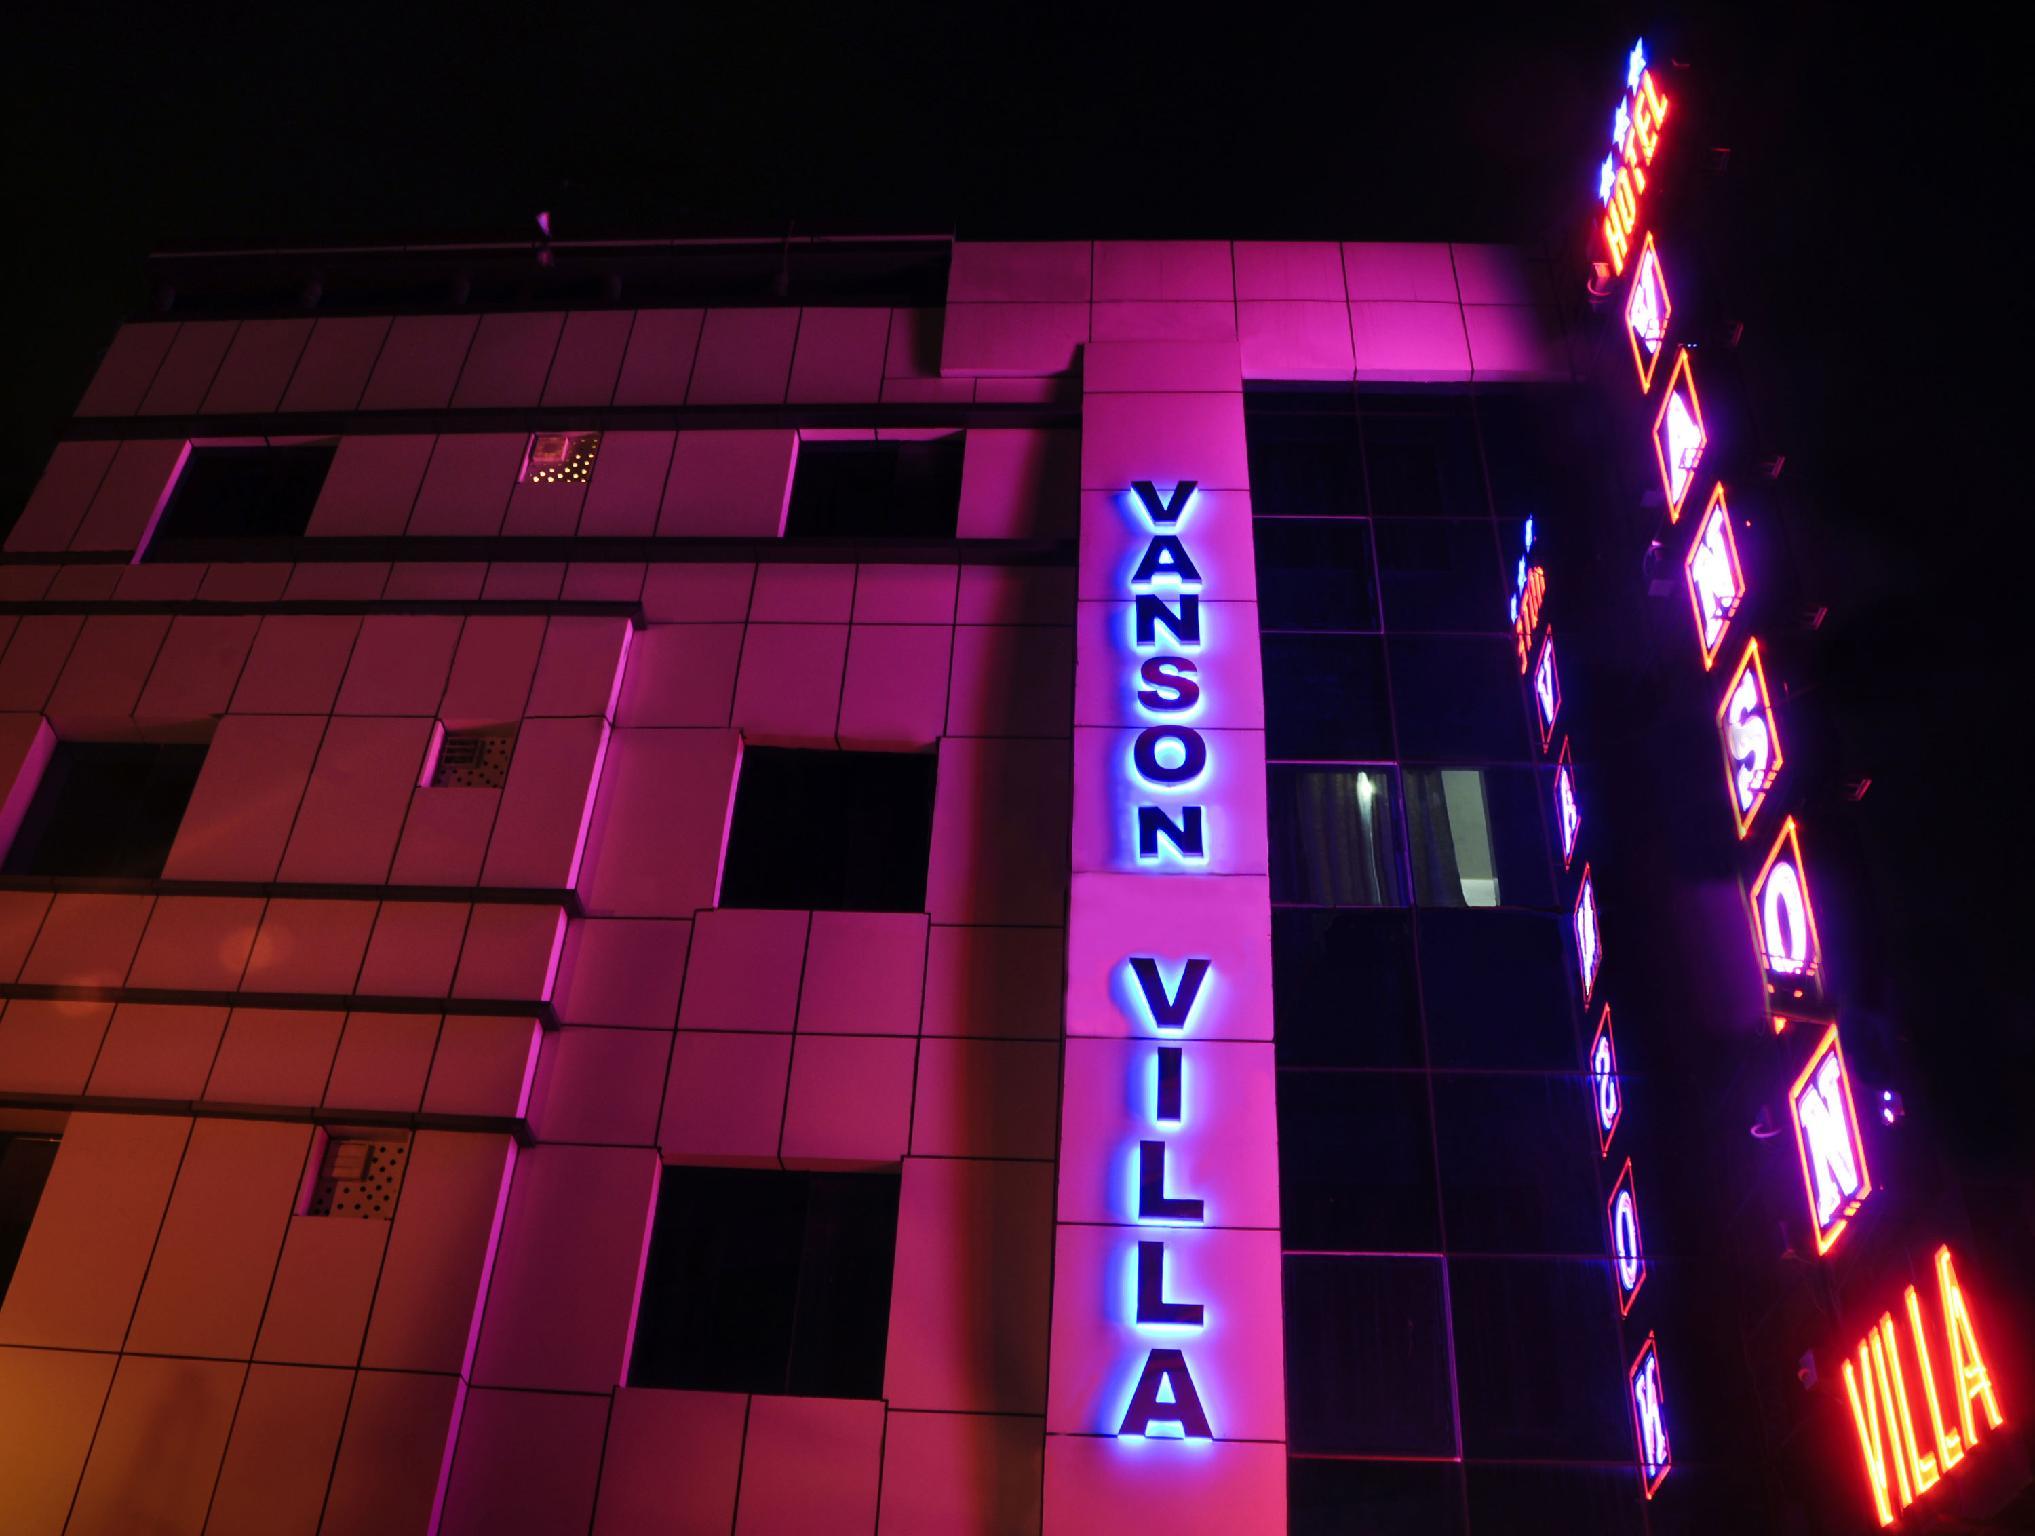 Hotell Vanson Villa